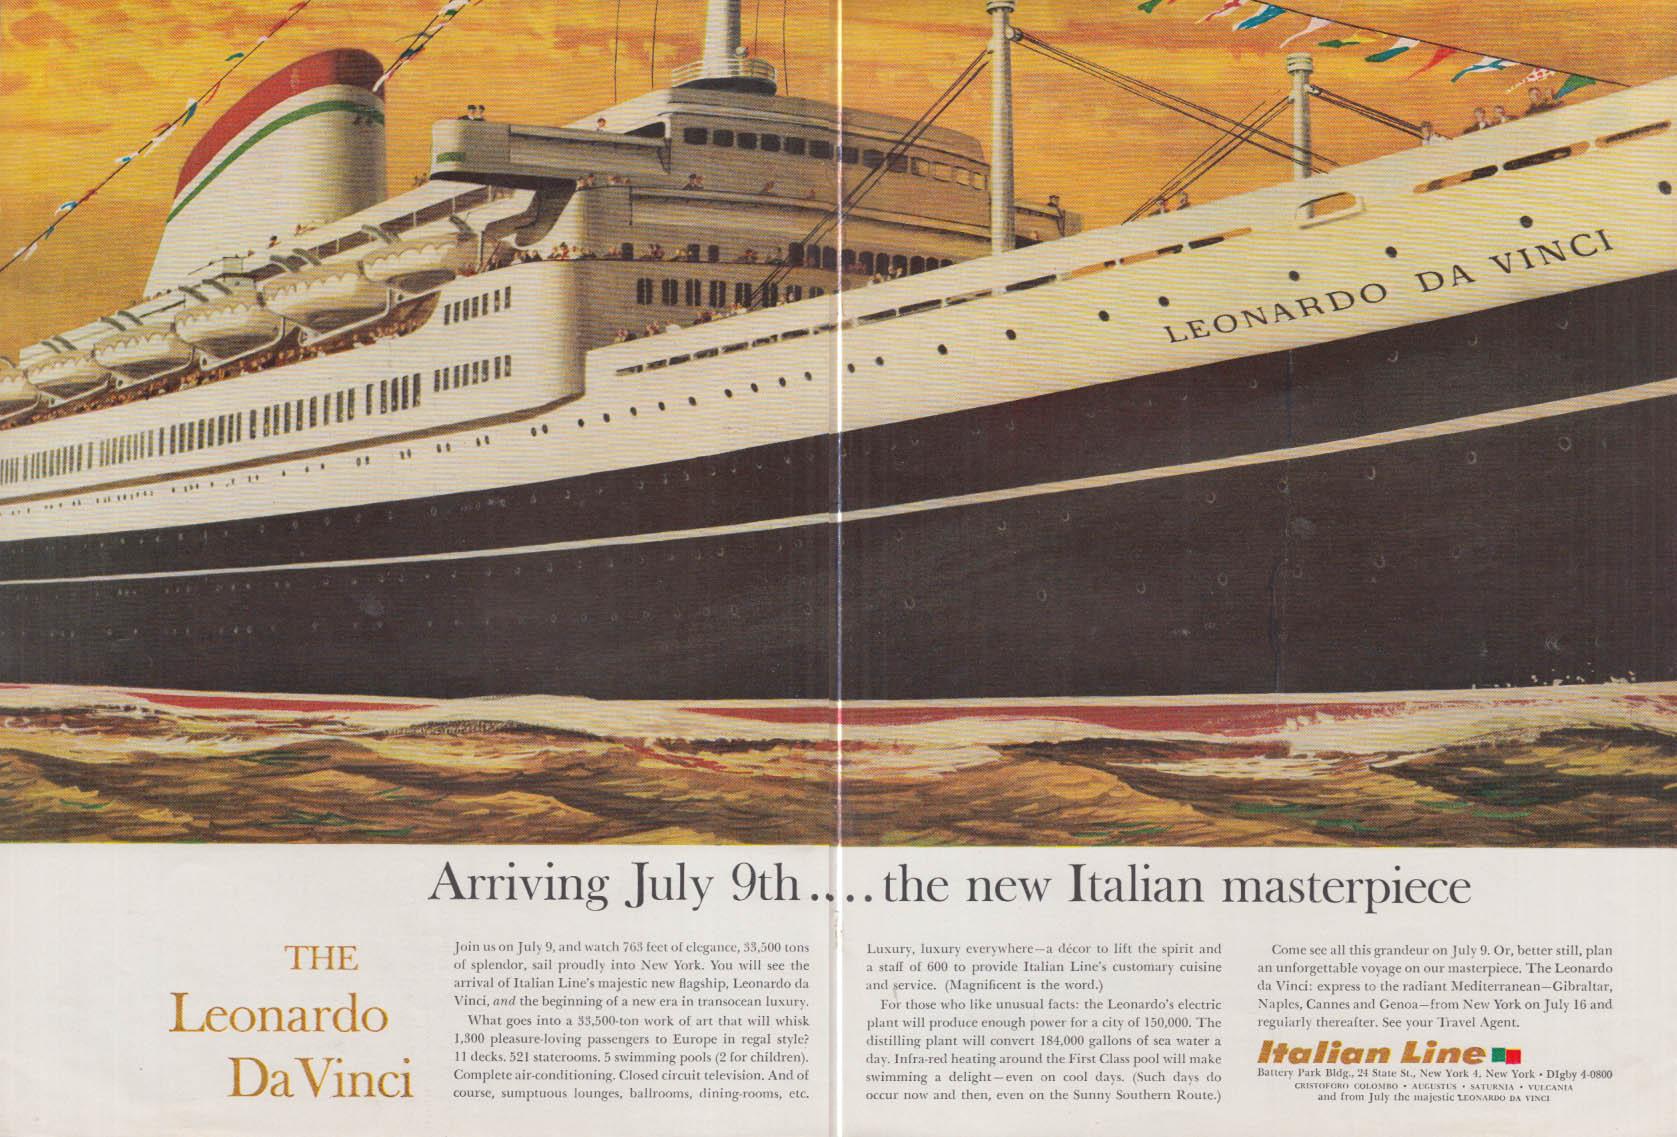 Image for Arriving July 9th The new Italian Masterpiece S S Leonardo Da Vinci ad 1960 NY